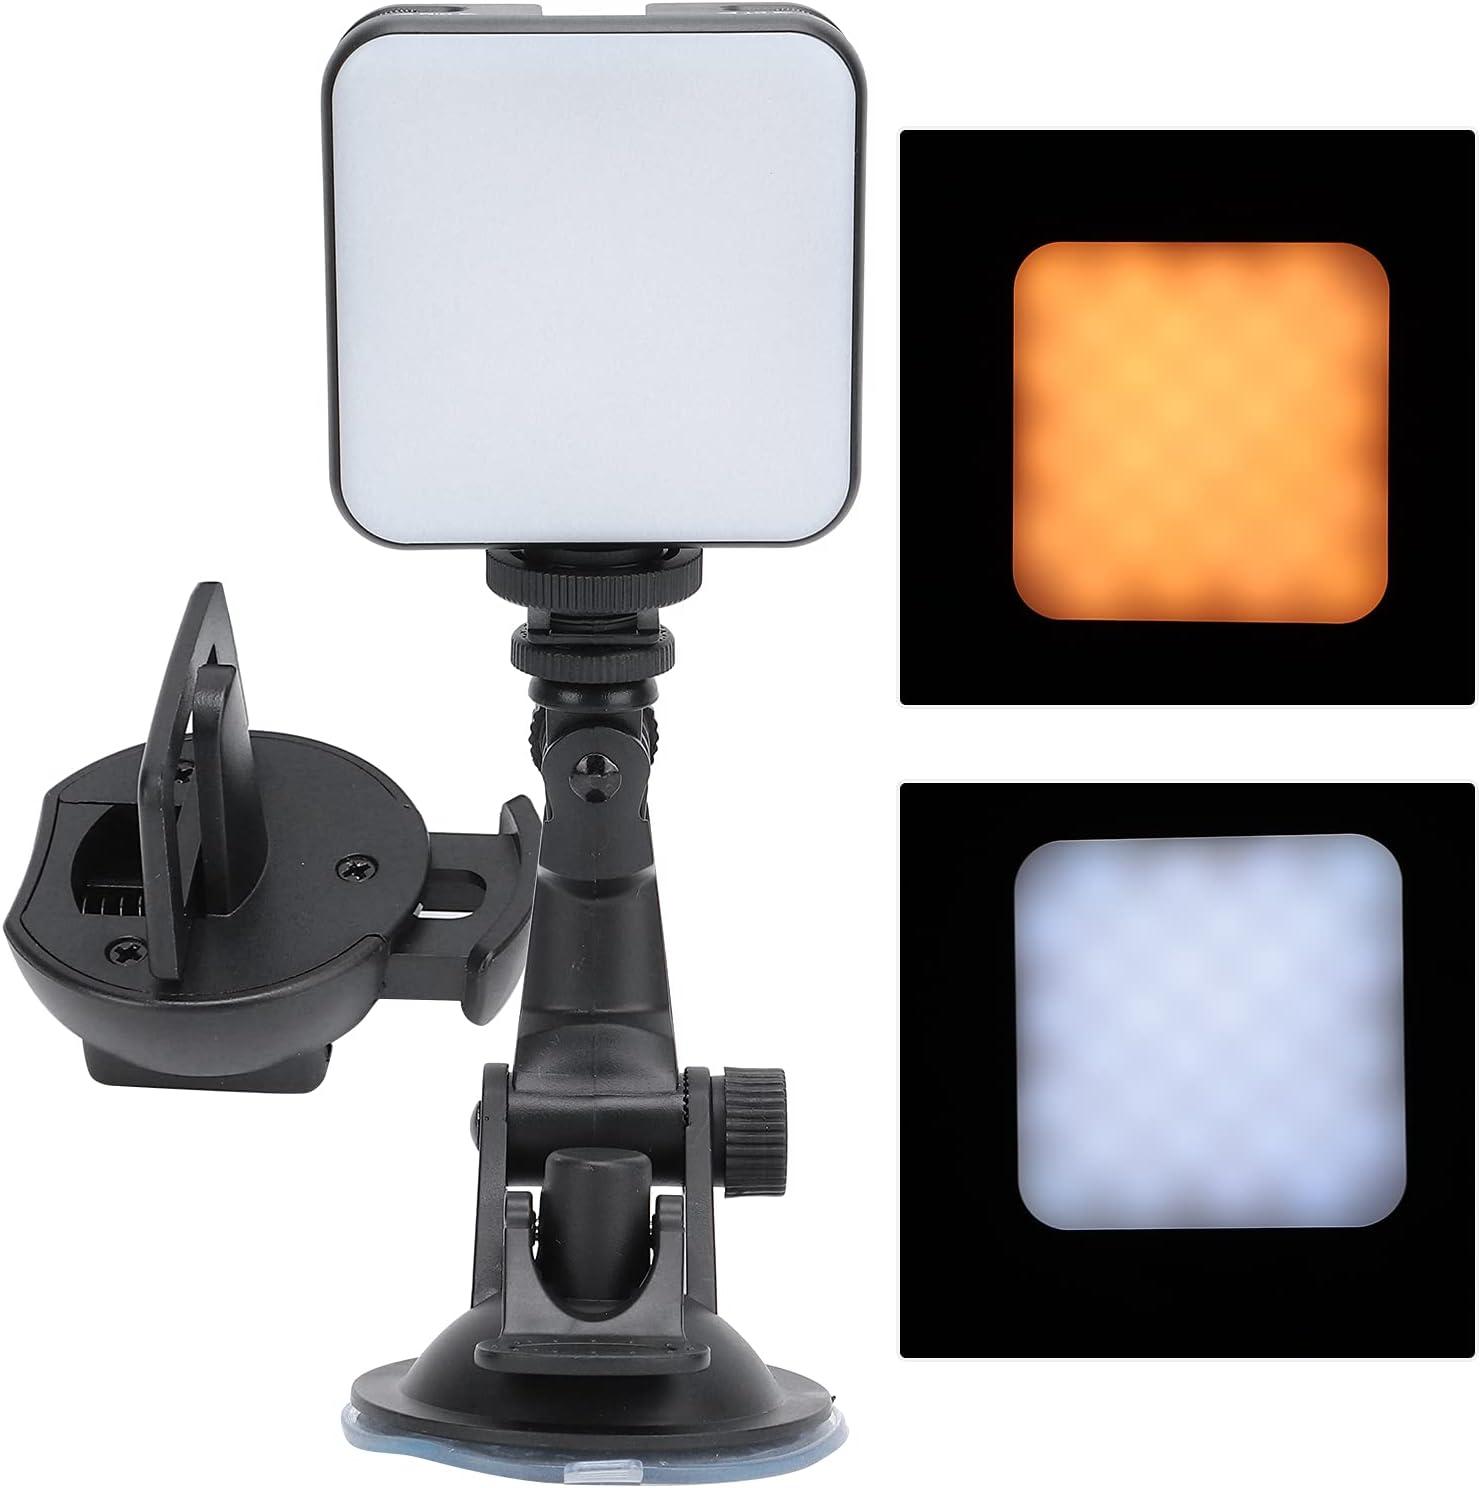 HAOX Portable Fill Light ABS Material Philadelphia Mall Max 61% OFF Stro Not Shake